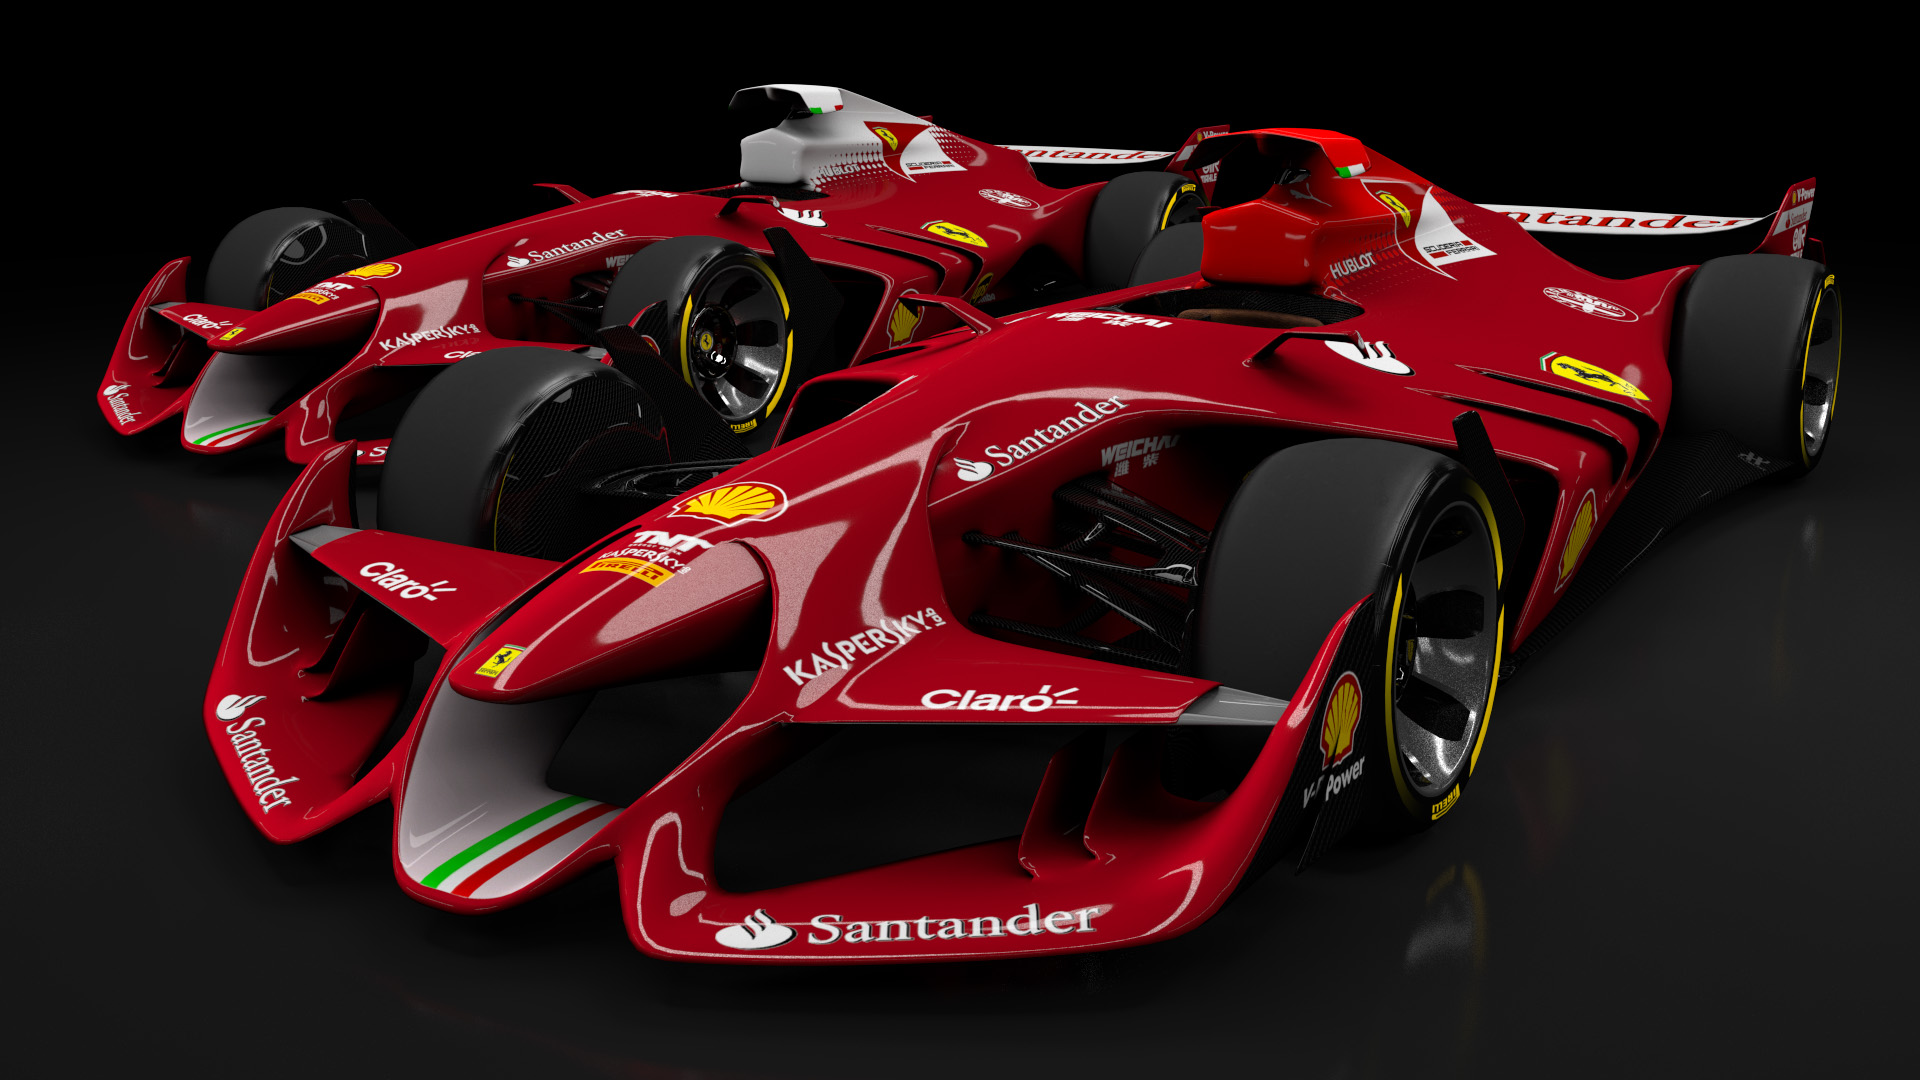 Ferrari F1 Concept 1.01 For AC